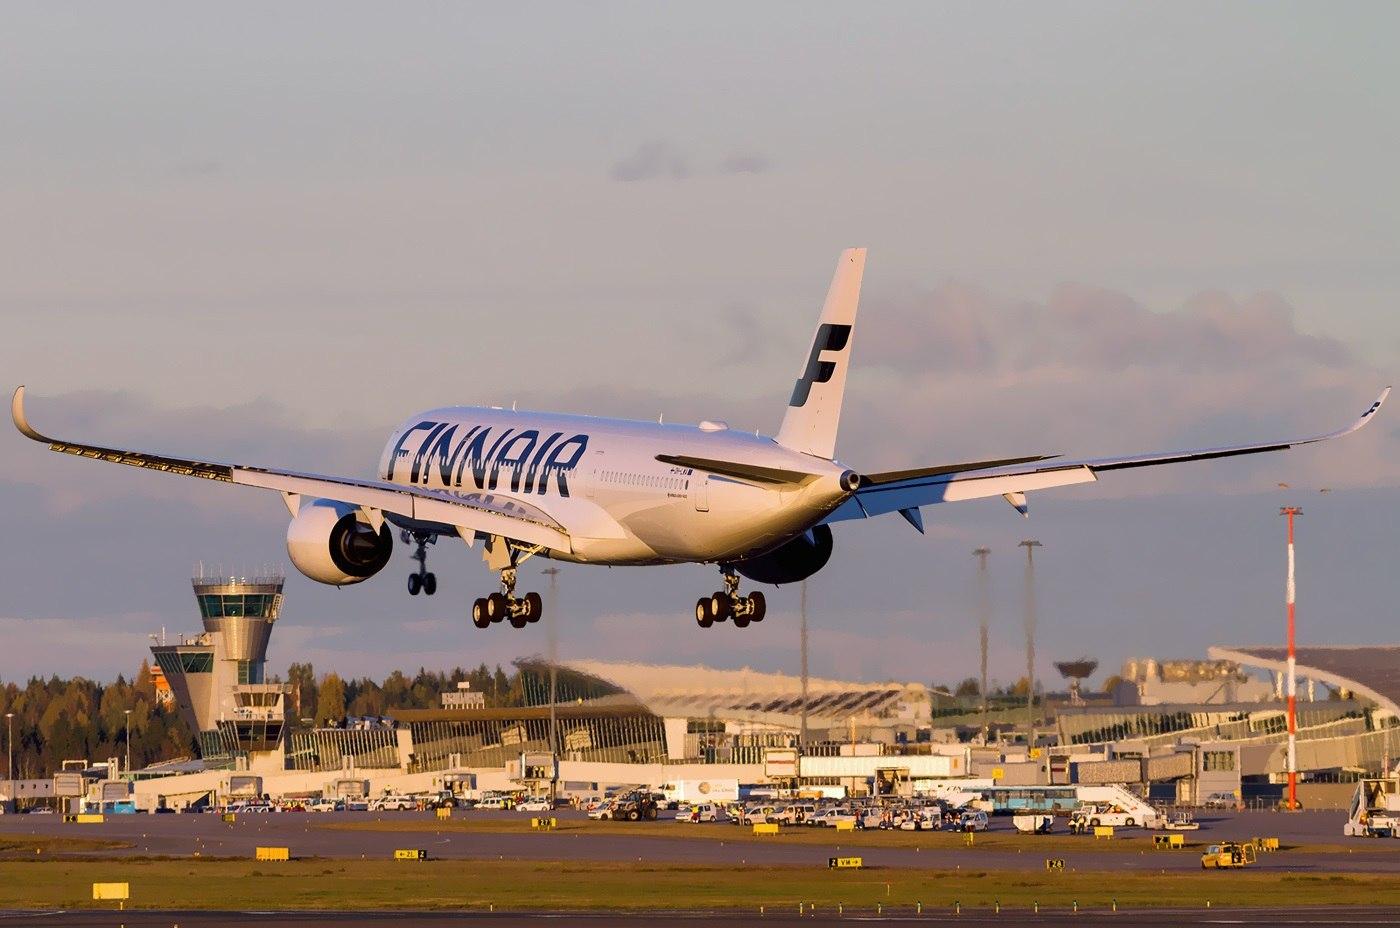 Взлет Airbus A350 XWB финского перевозчика